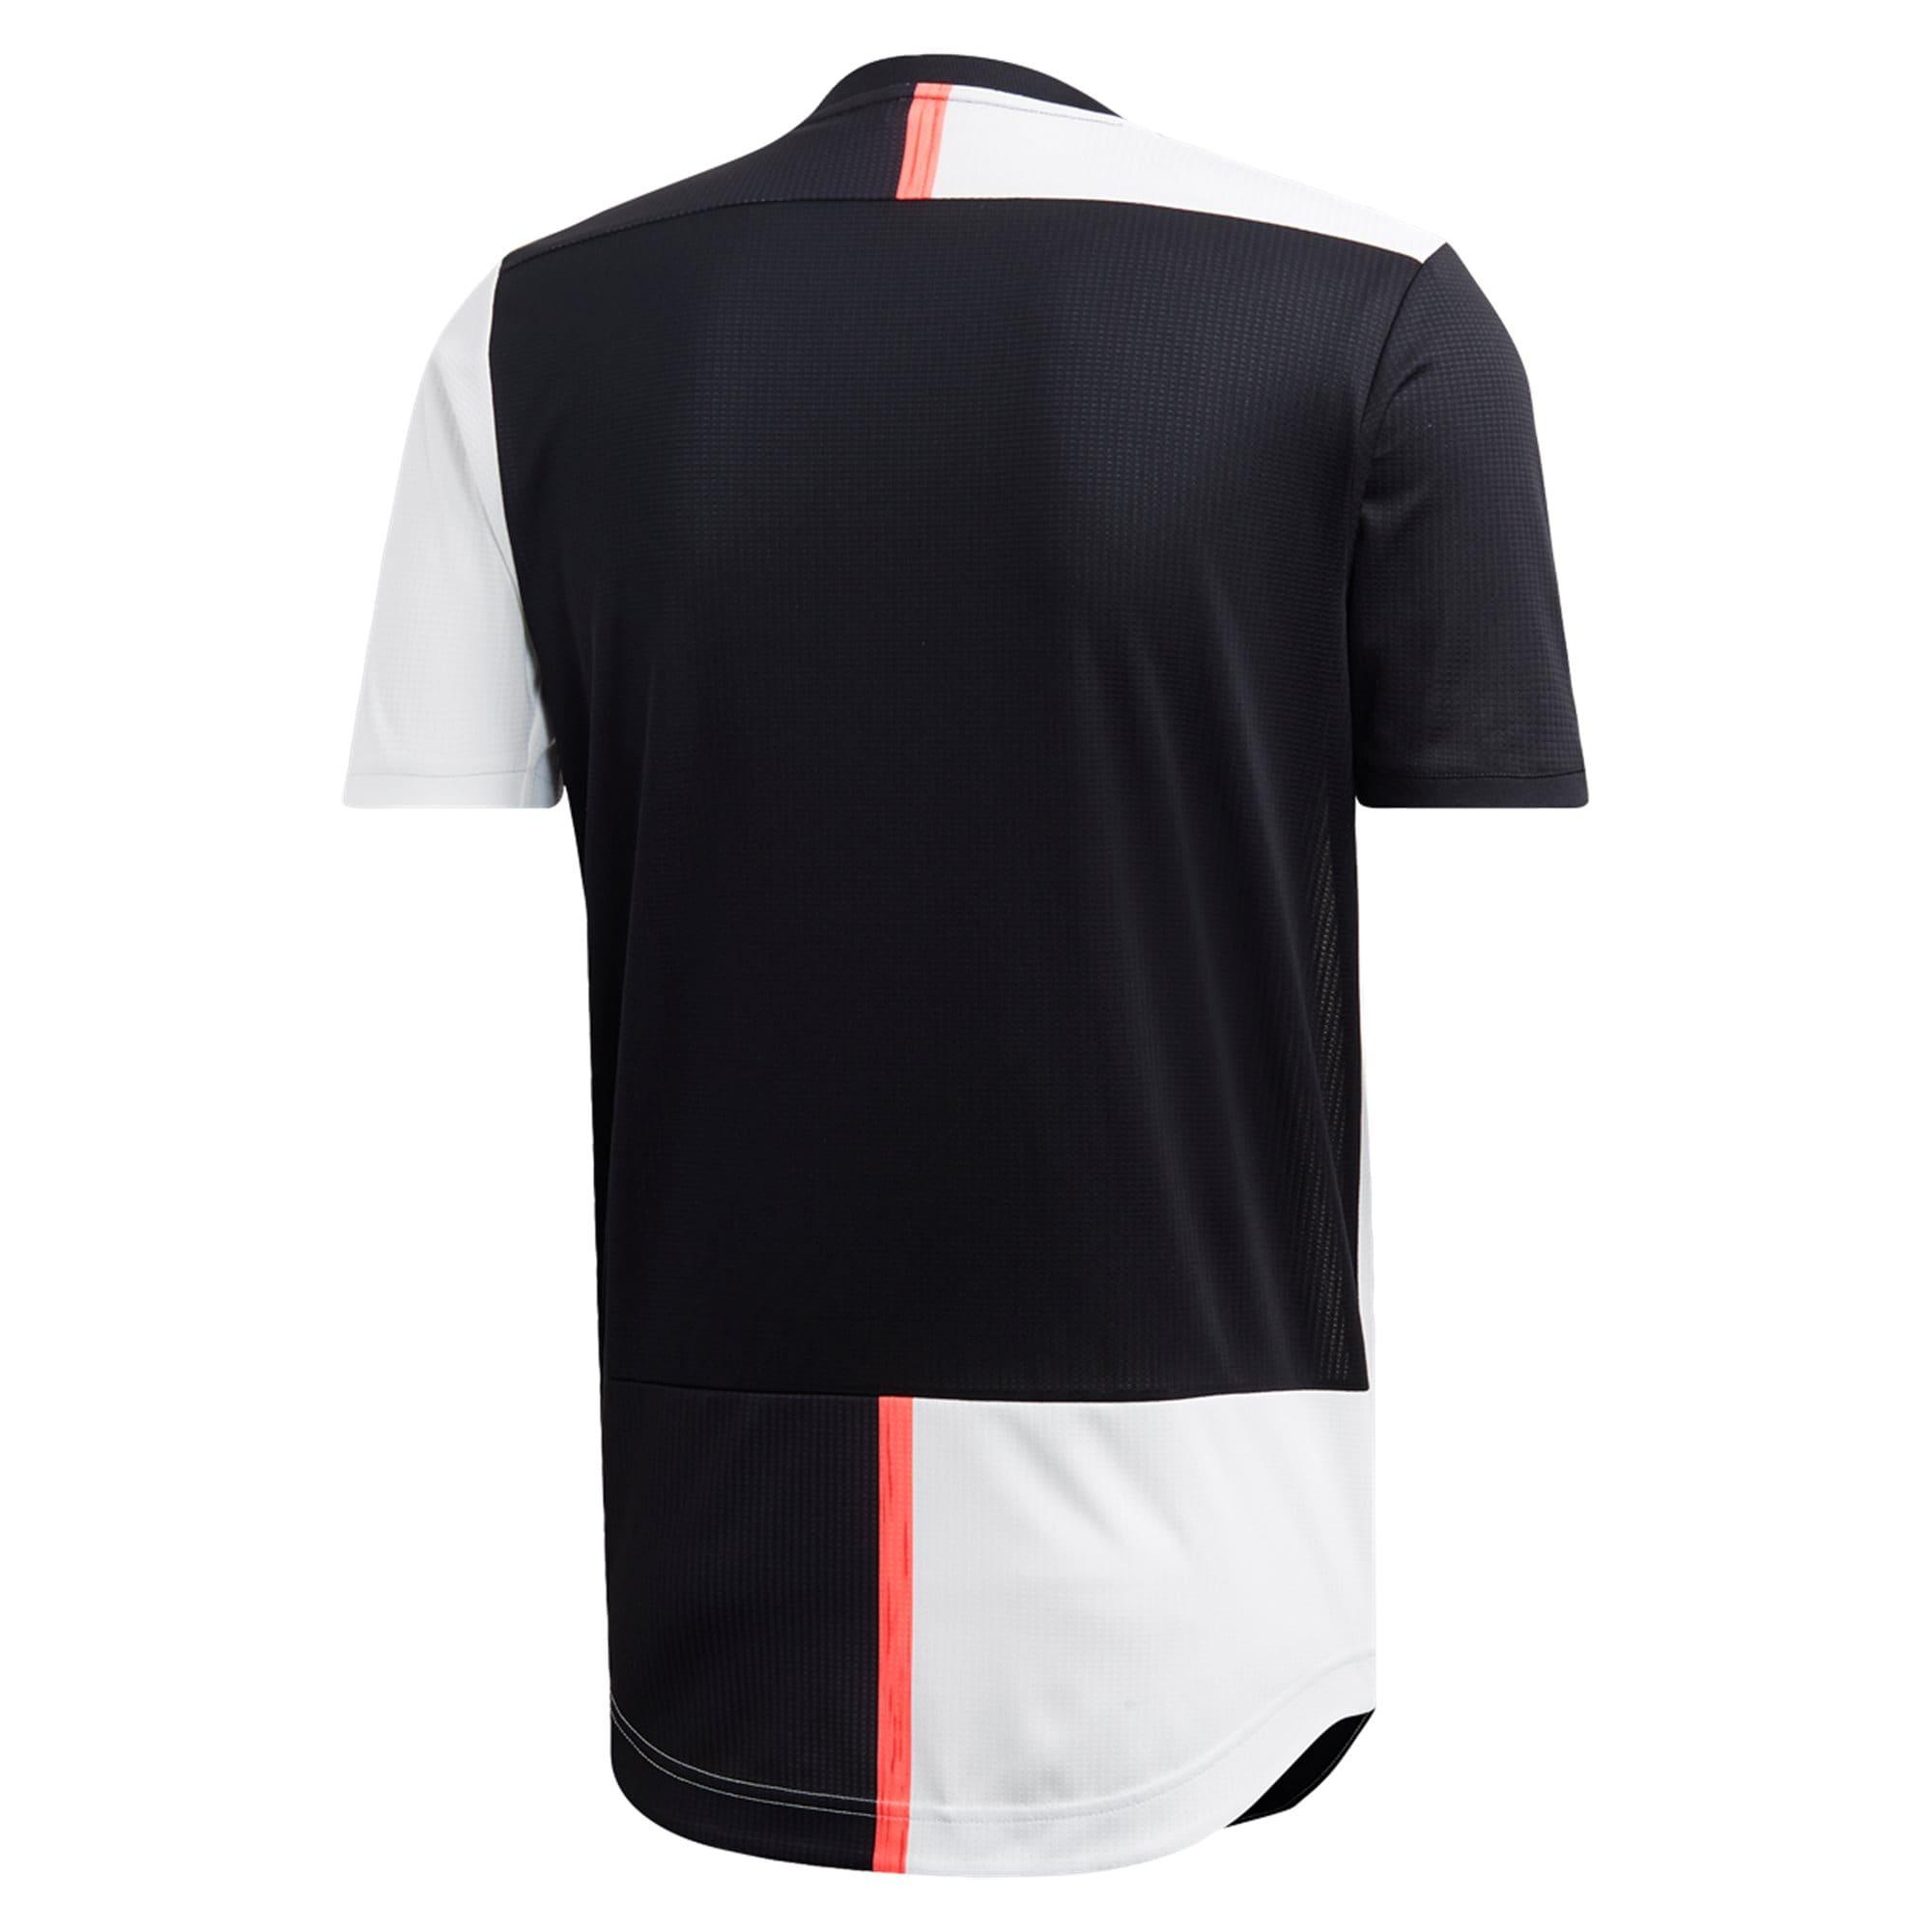 JUVENTUS HOME soccer jersey 2019/2020 Player version